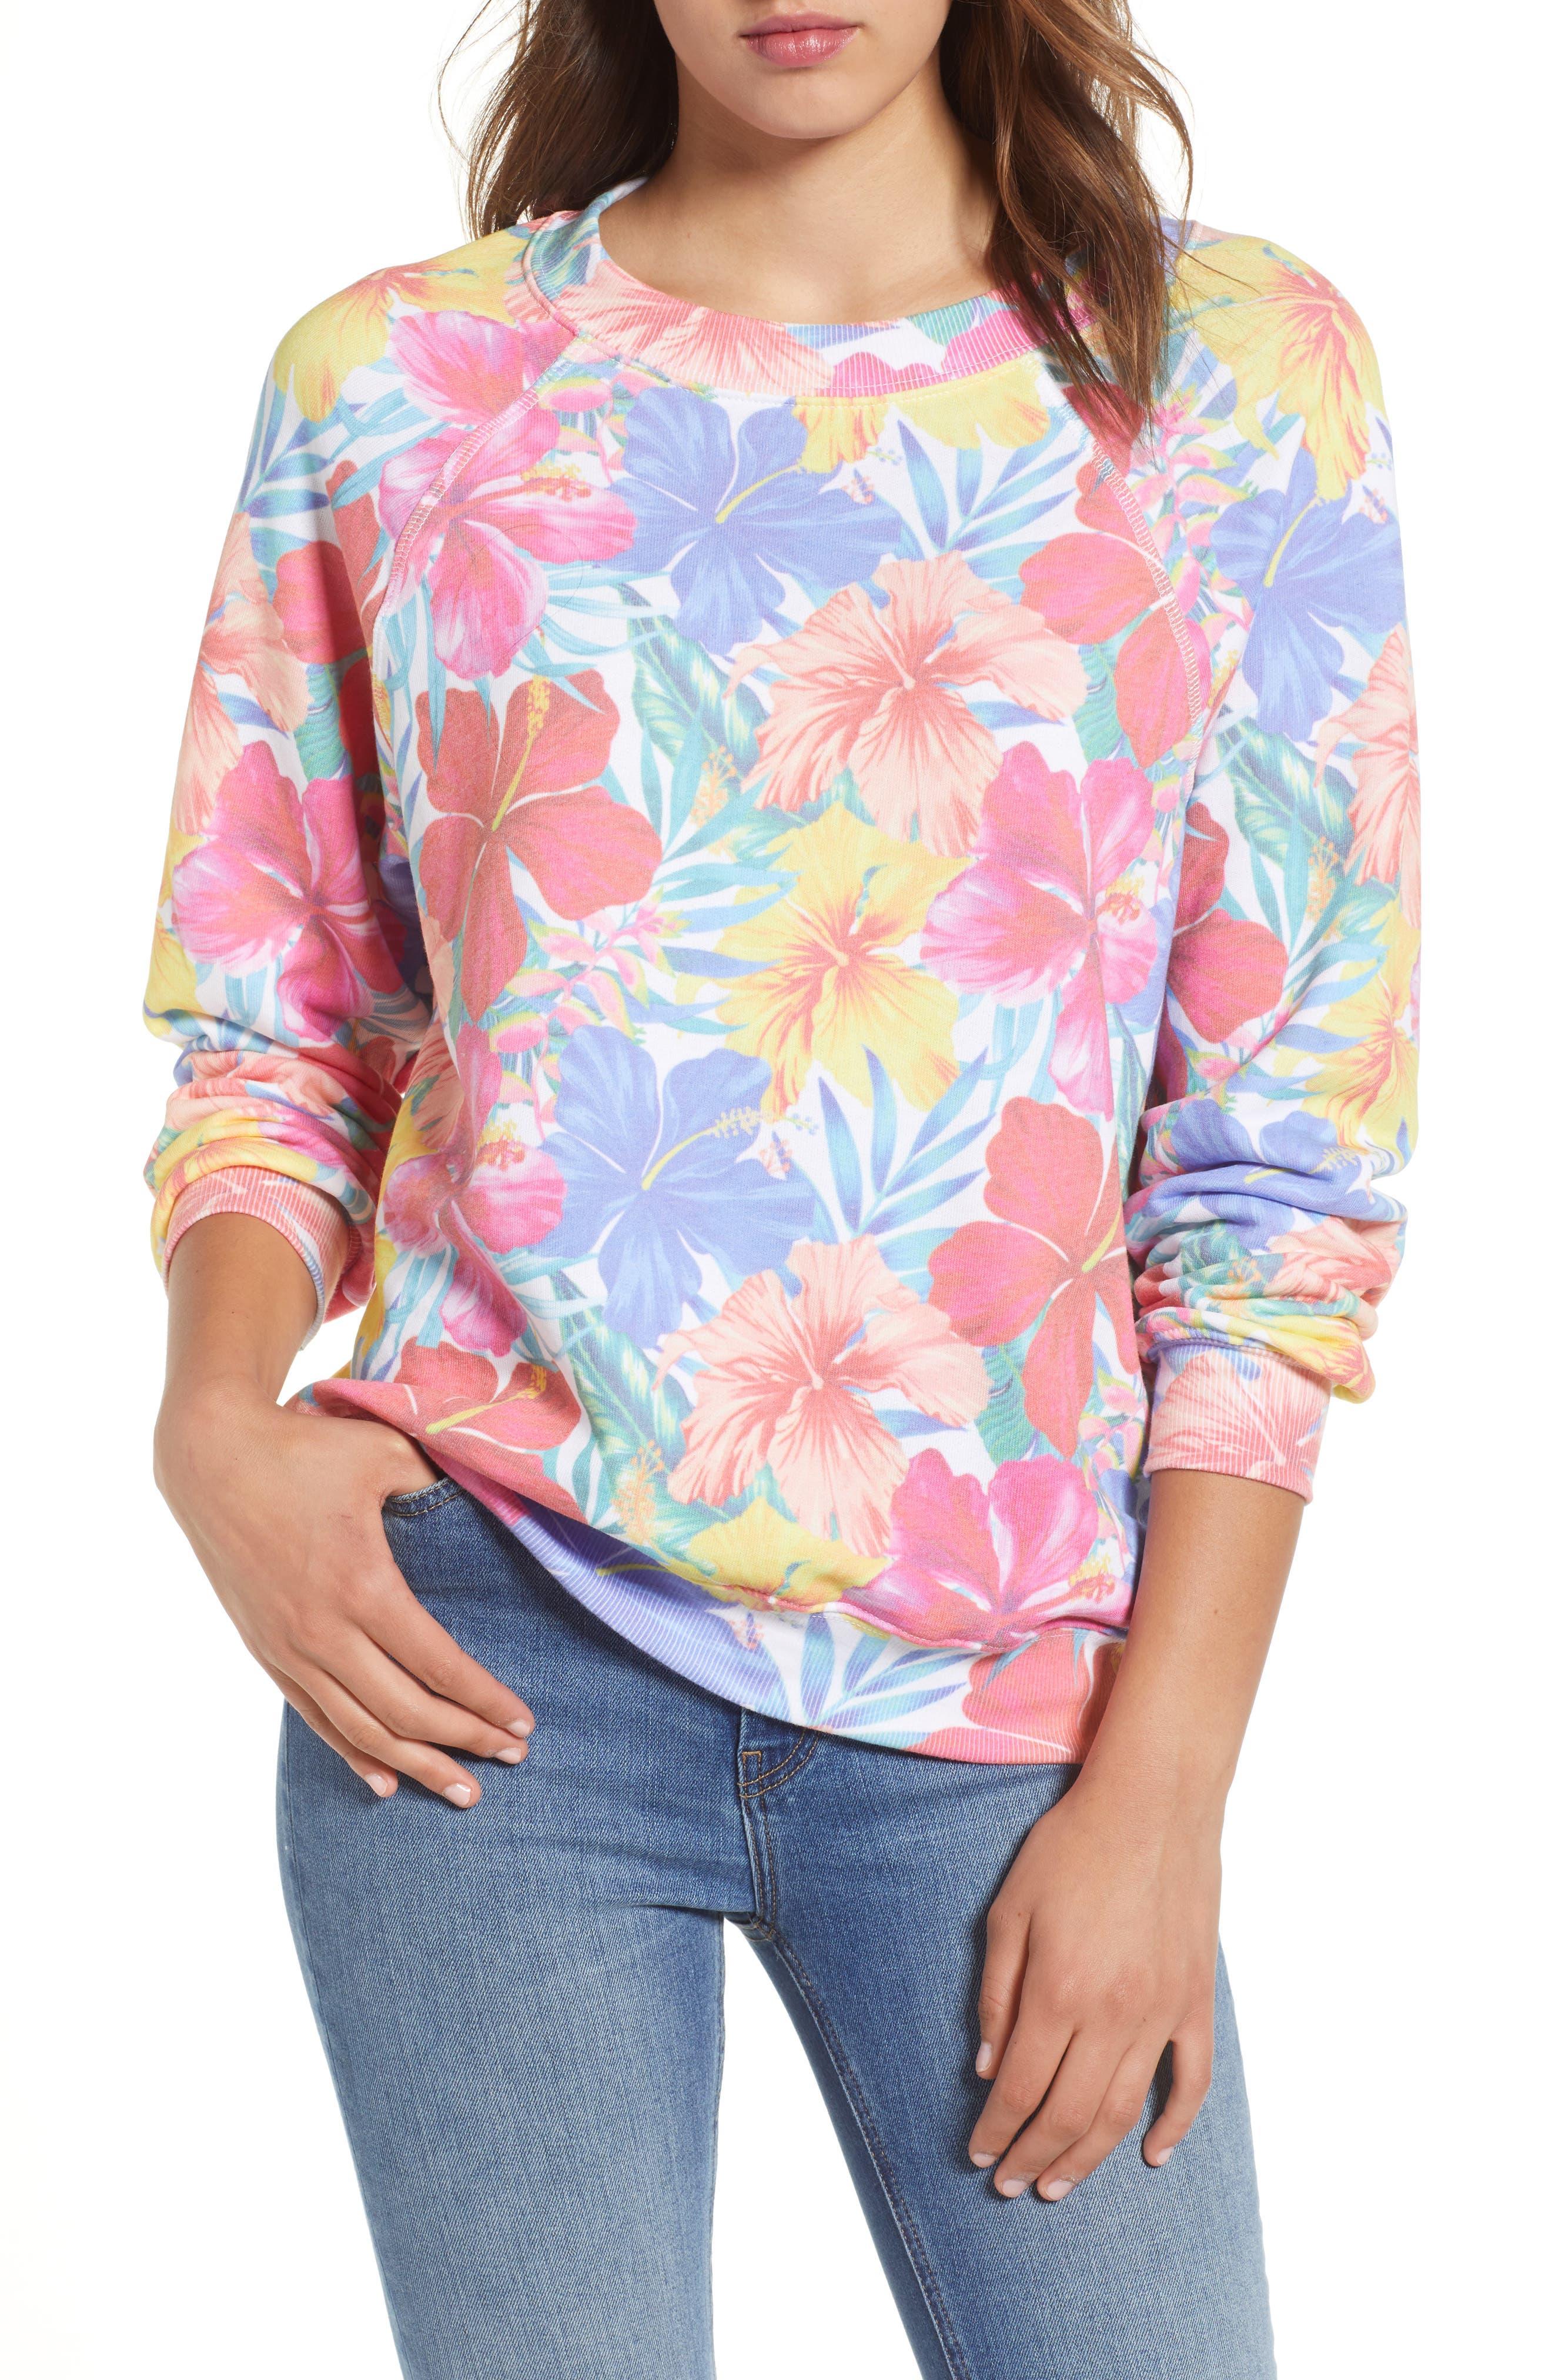 Tropicalia Sommers Sweatshirt,                             Main thumbnail 1, color,                             Multi Colored